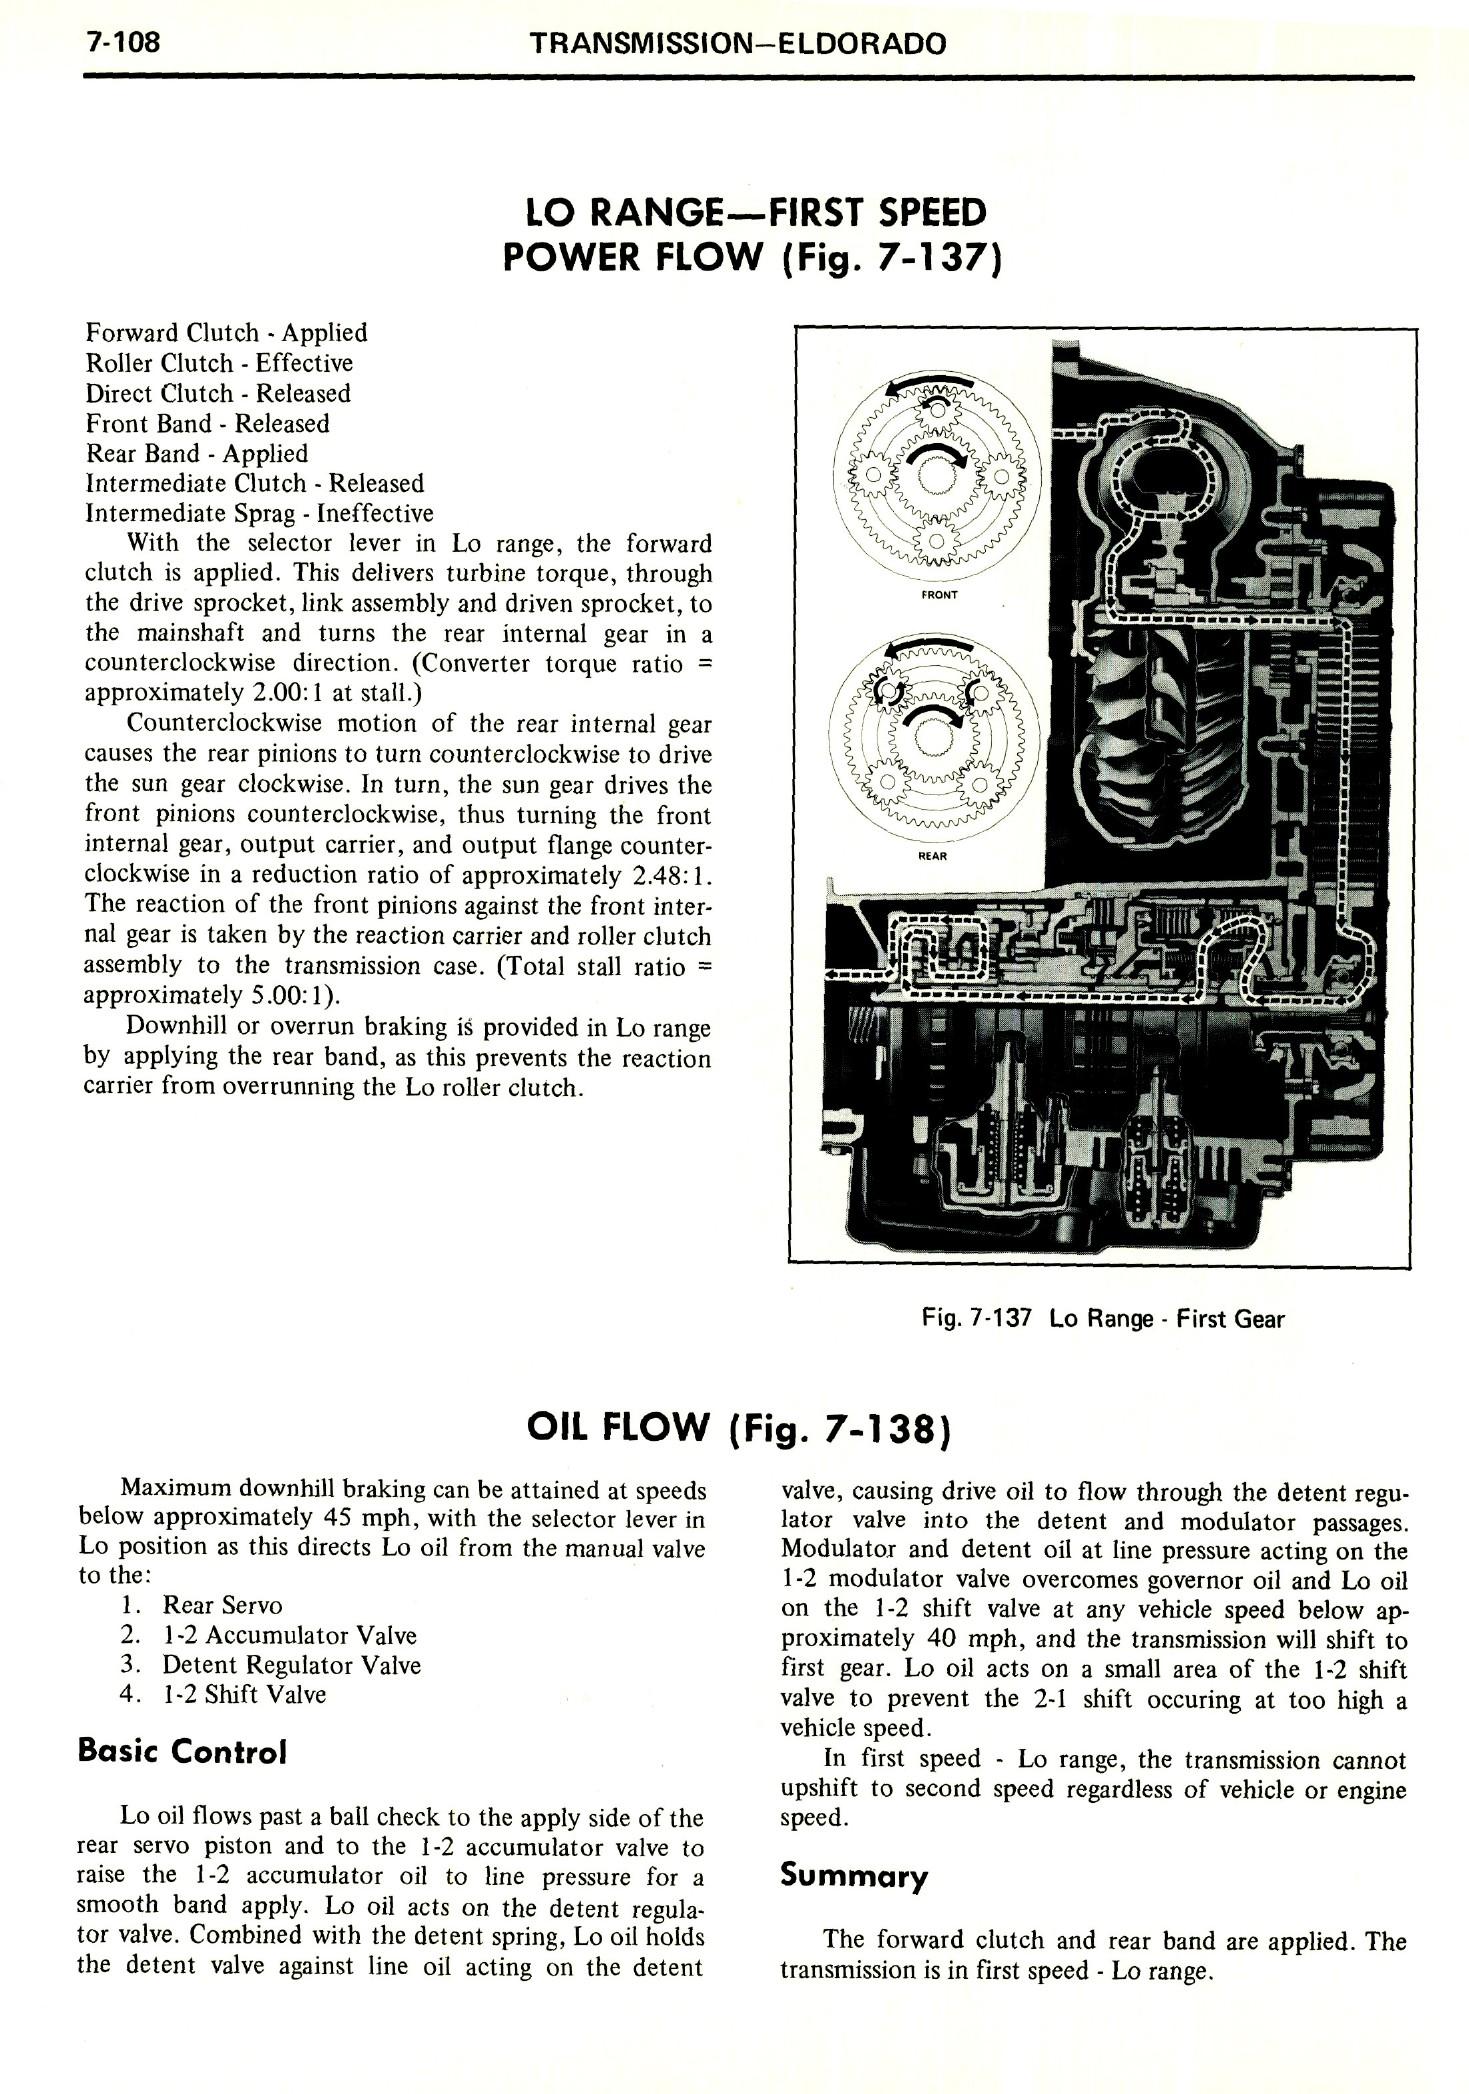 1971 Cadillac Shop Manual- Transmission Page 108 of 156